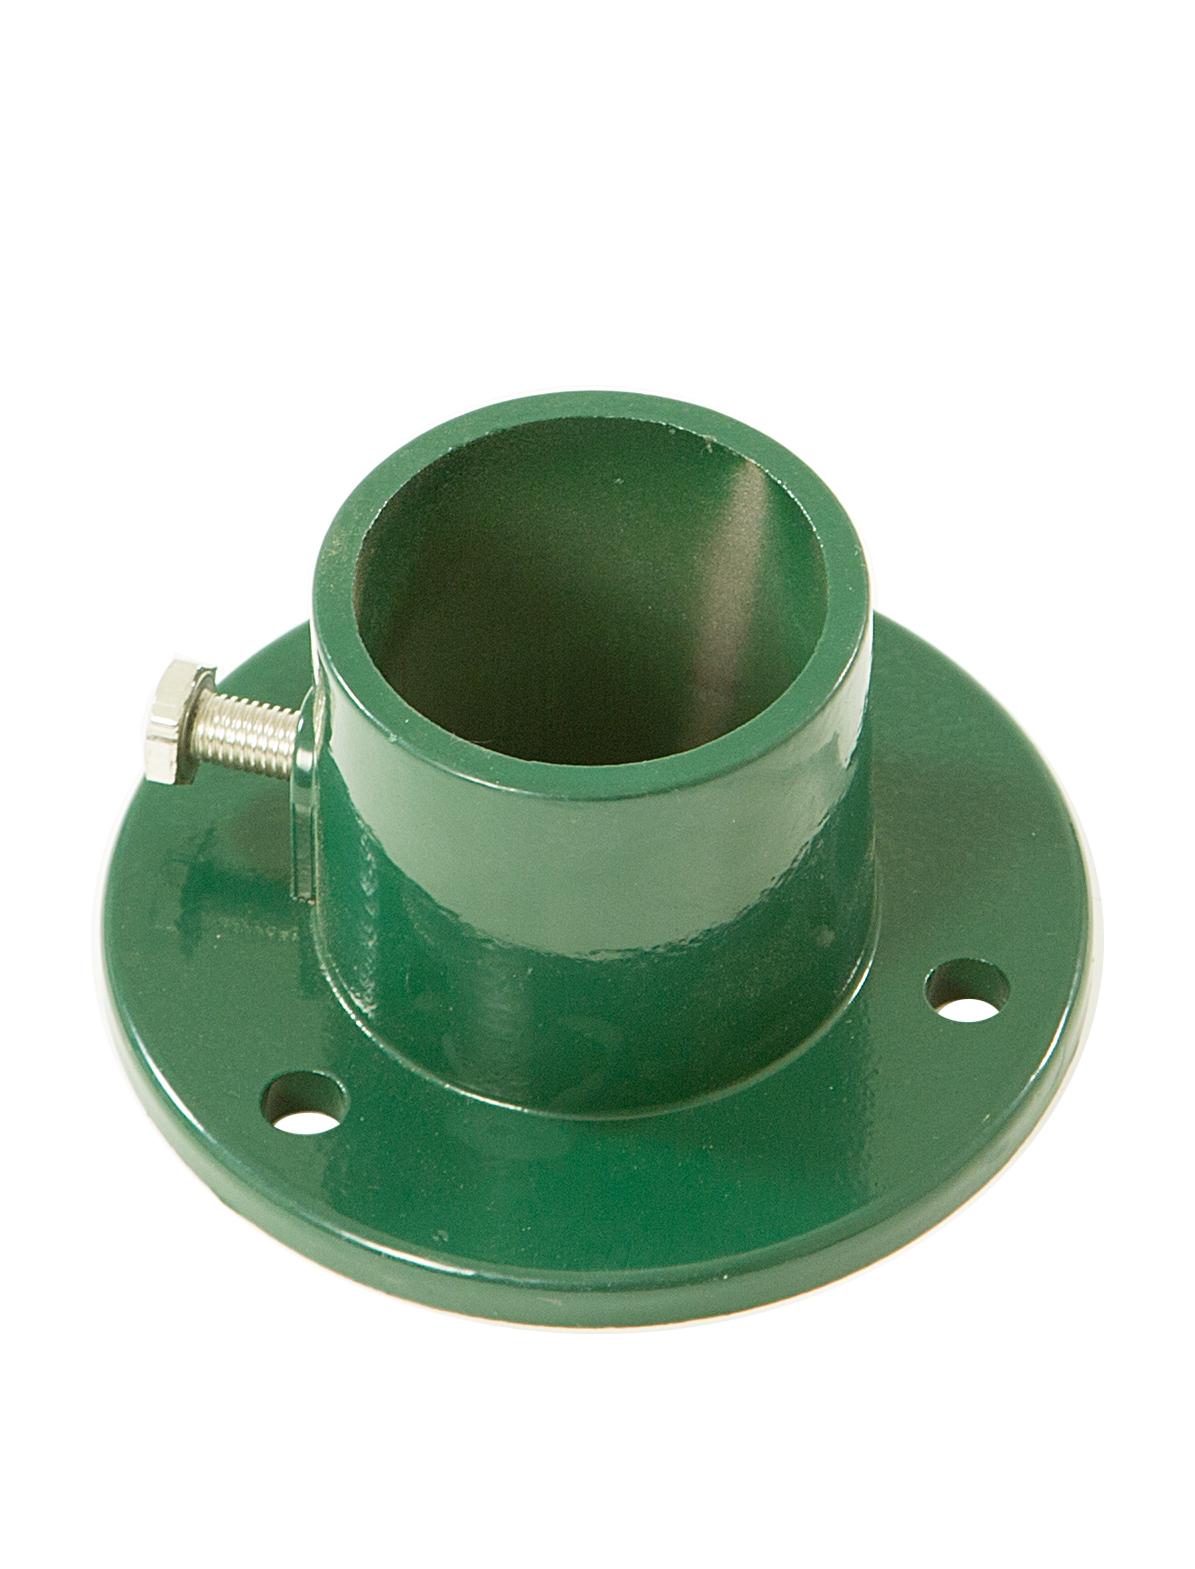 Fencing Post Holder Fencing System Green Base Plate